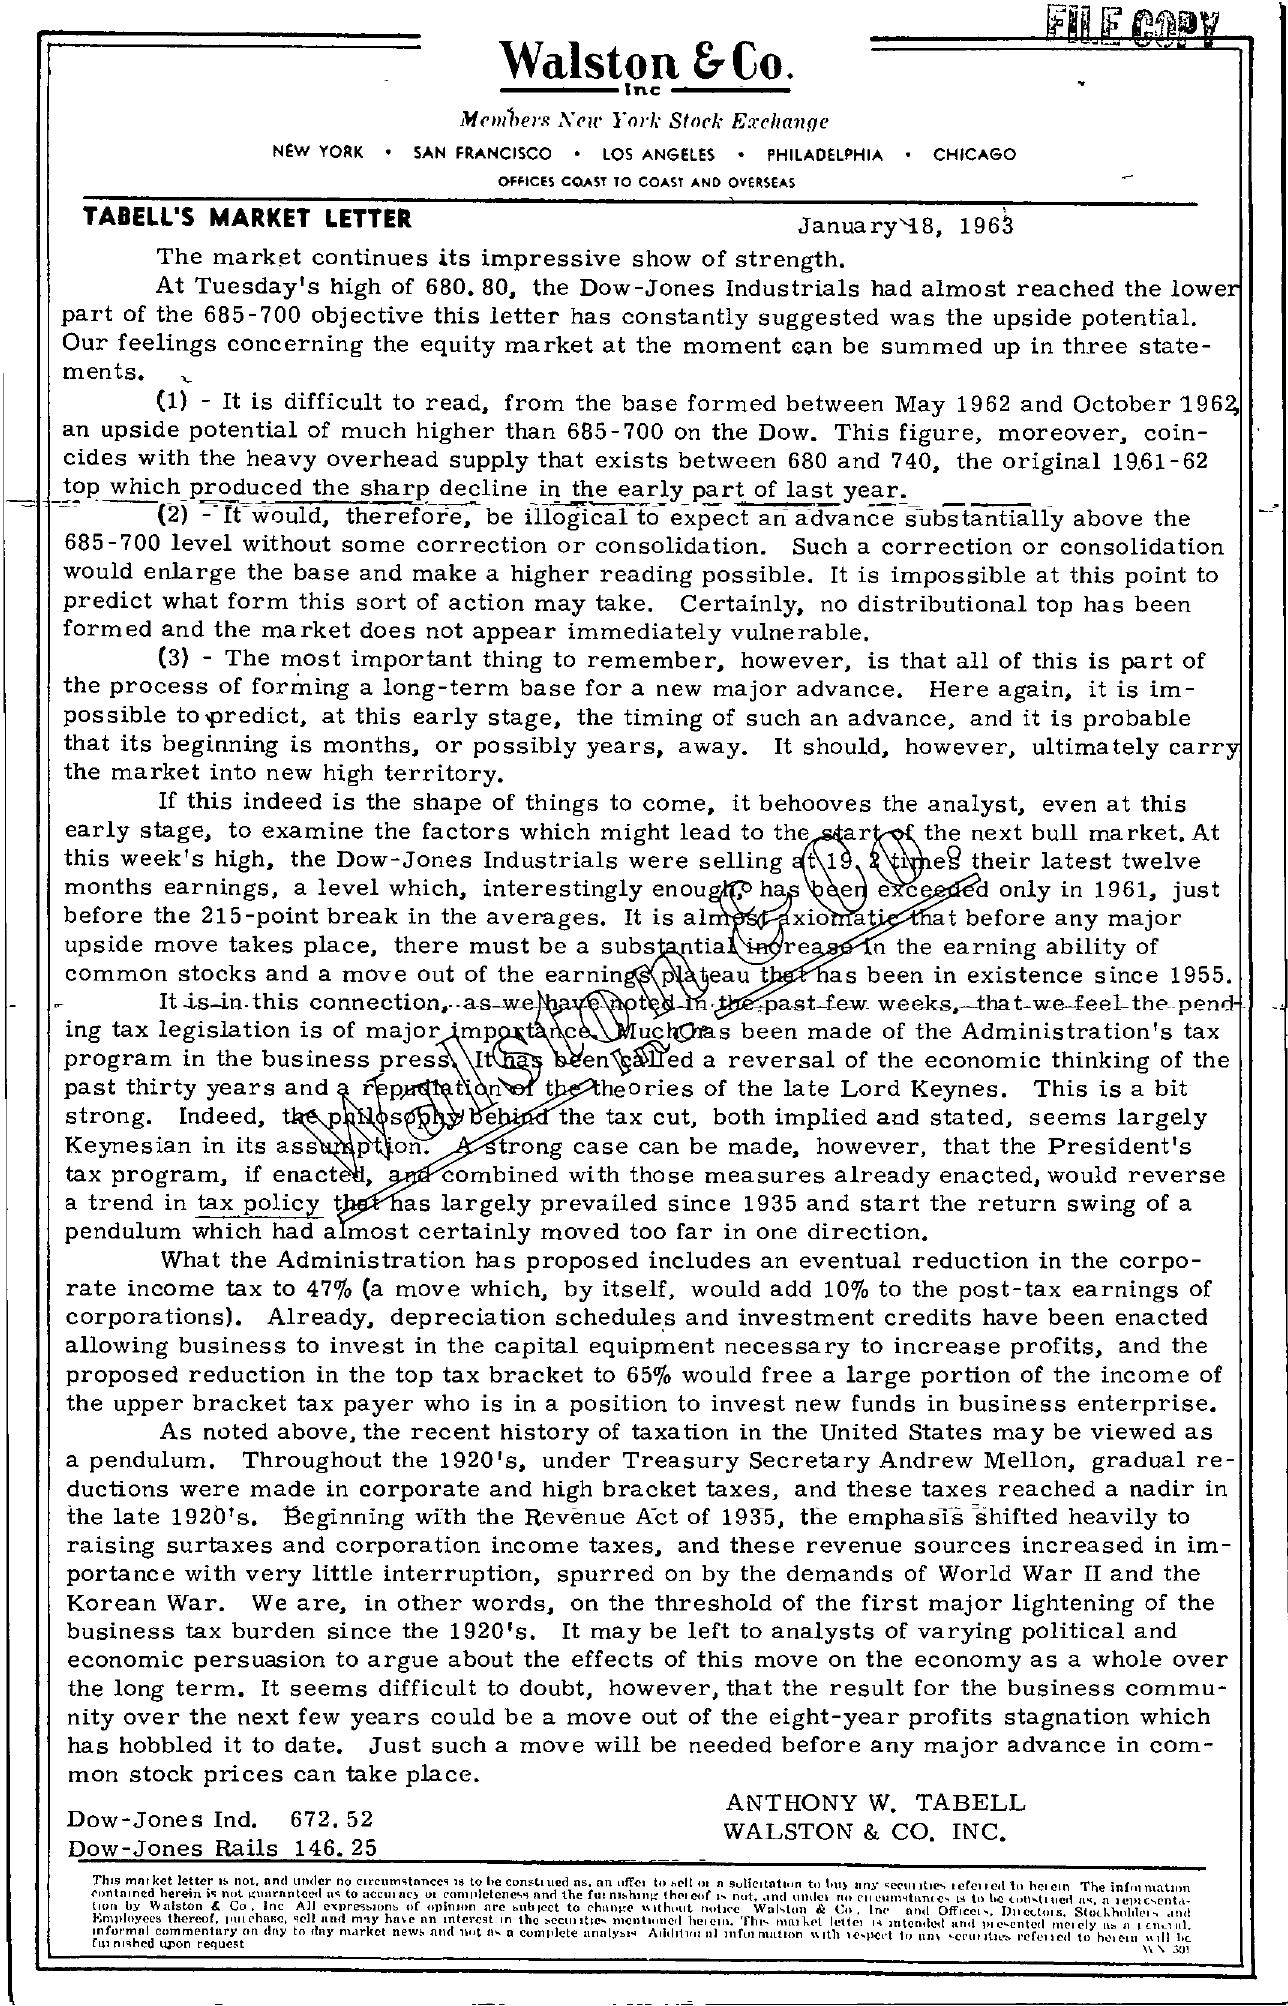 Tabell's Market Letter - January 18, 1963